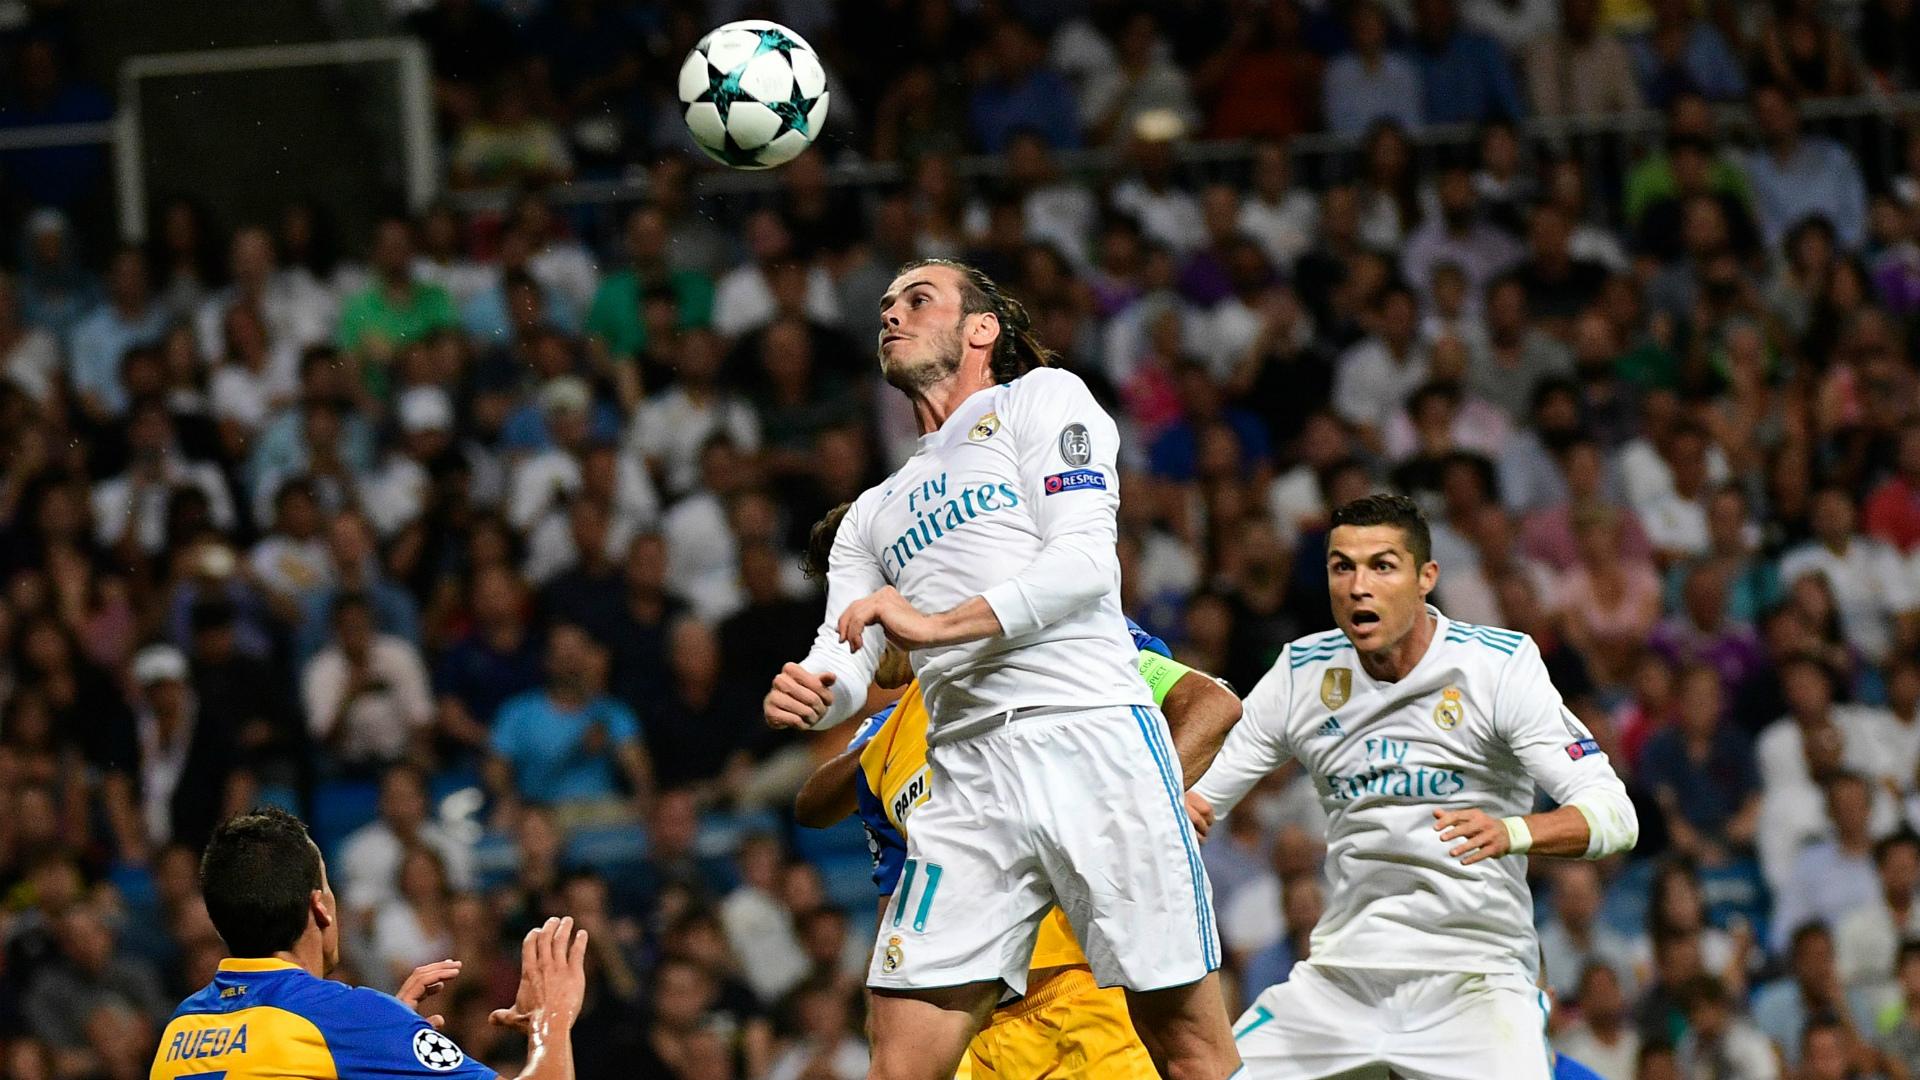 Gareth Bale Real Madrid APOEL Nicosia